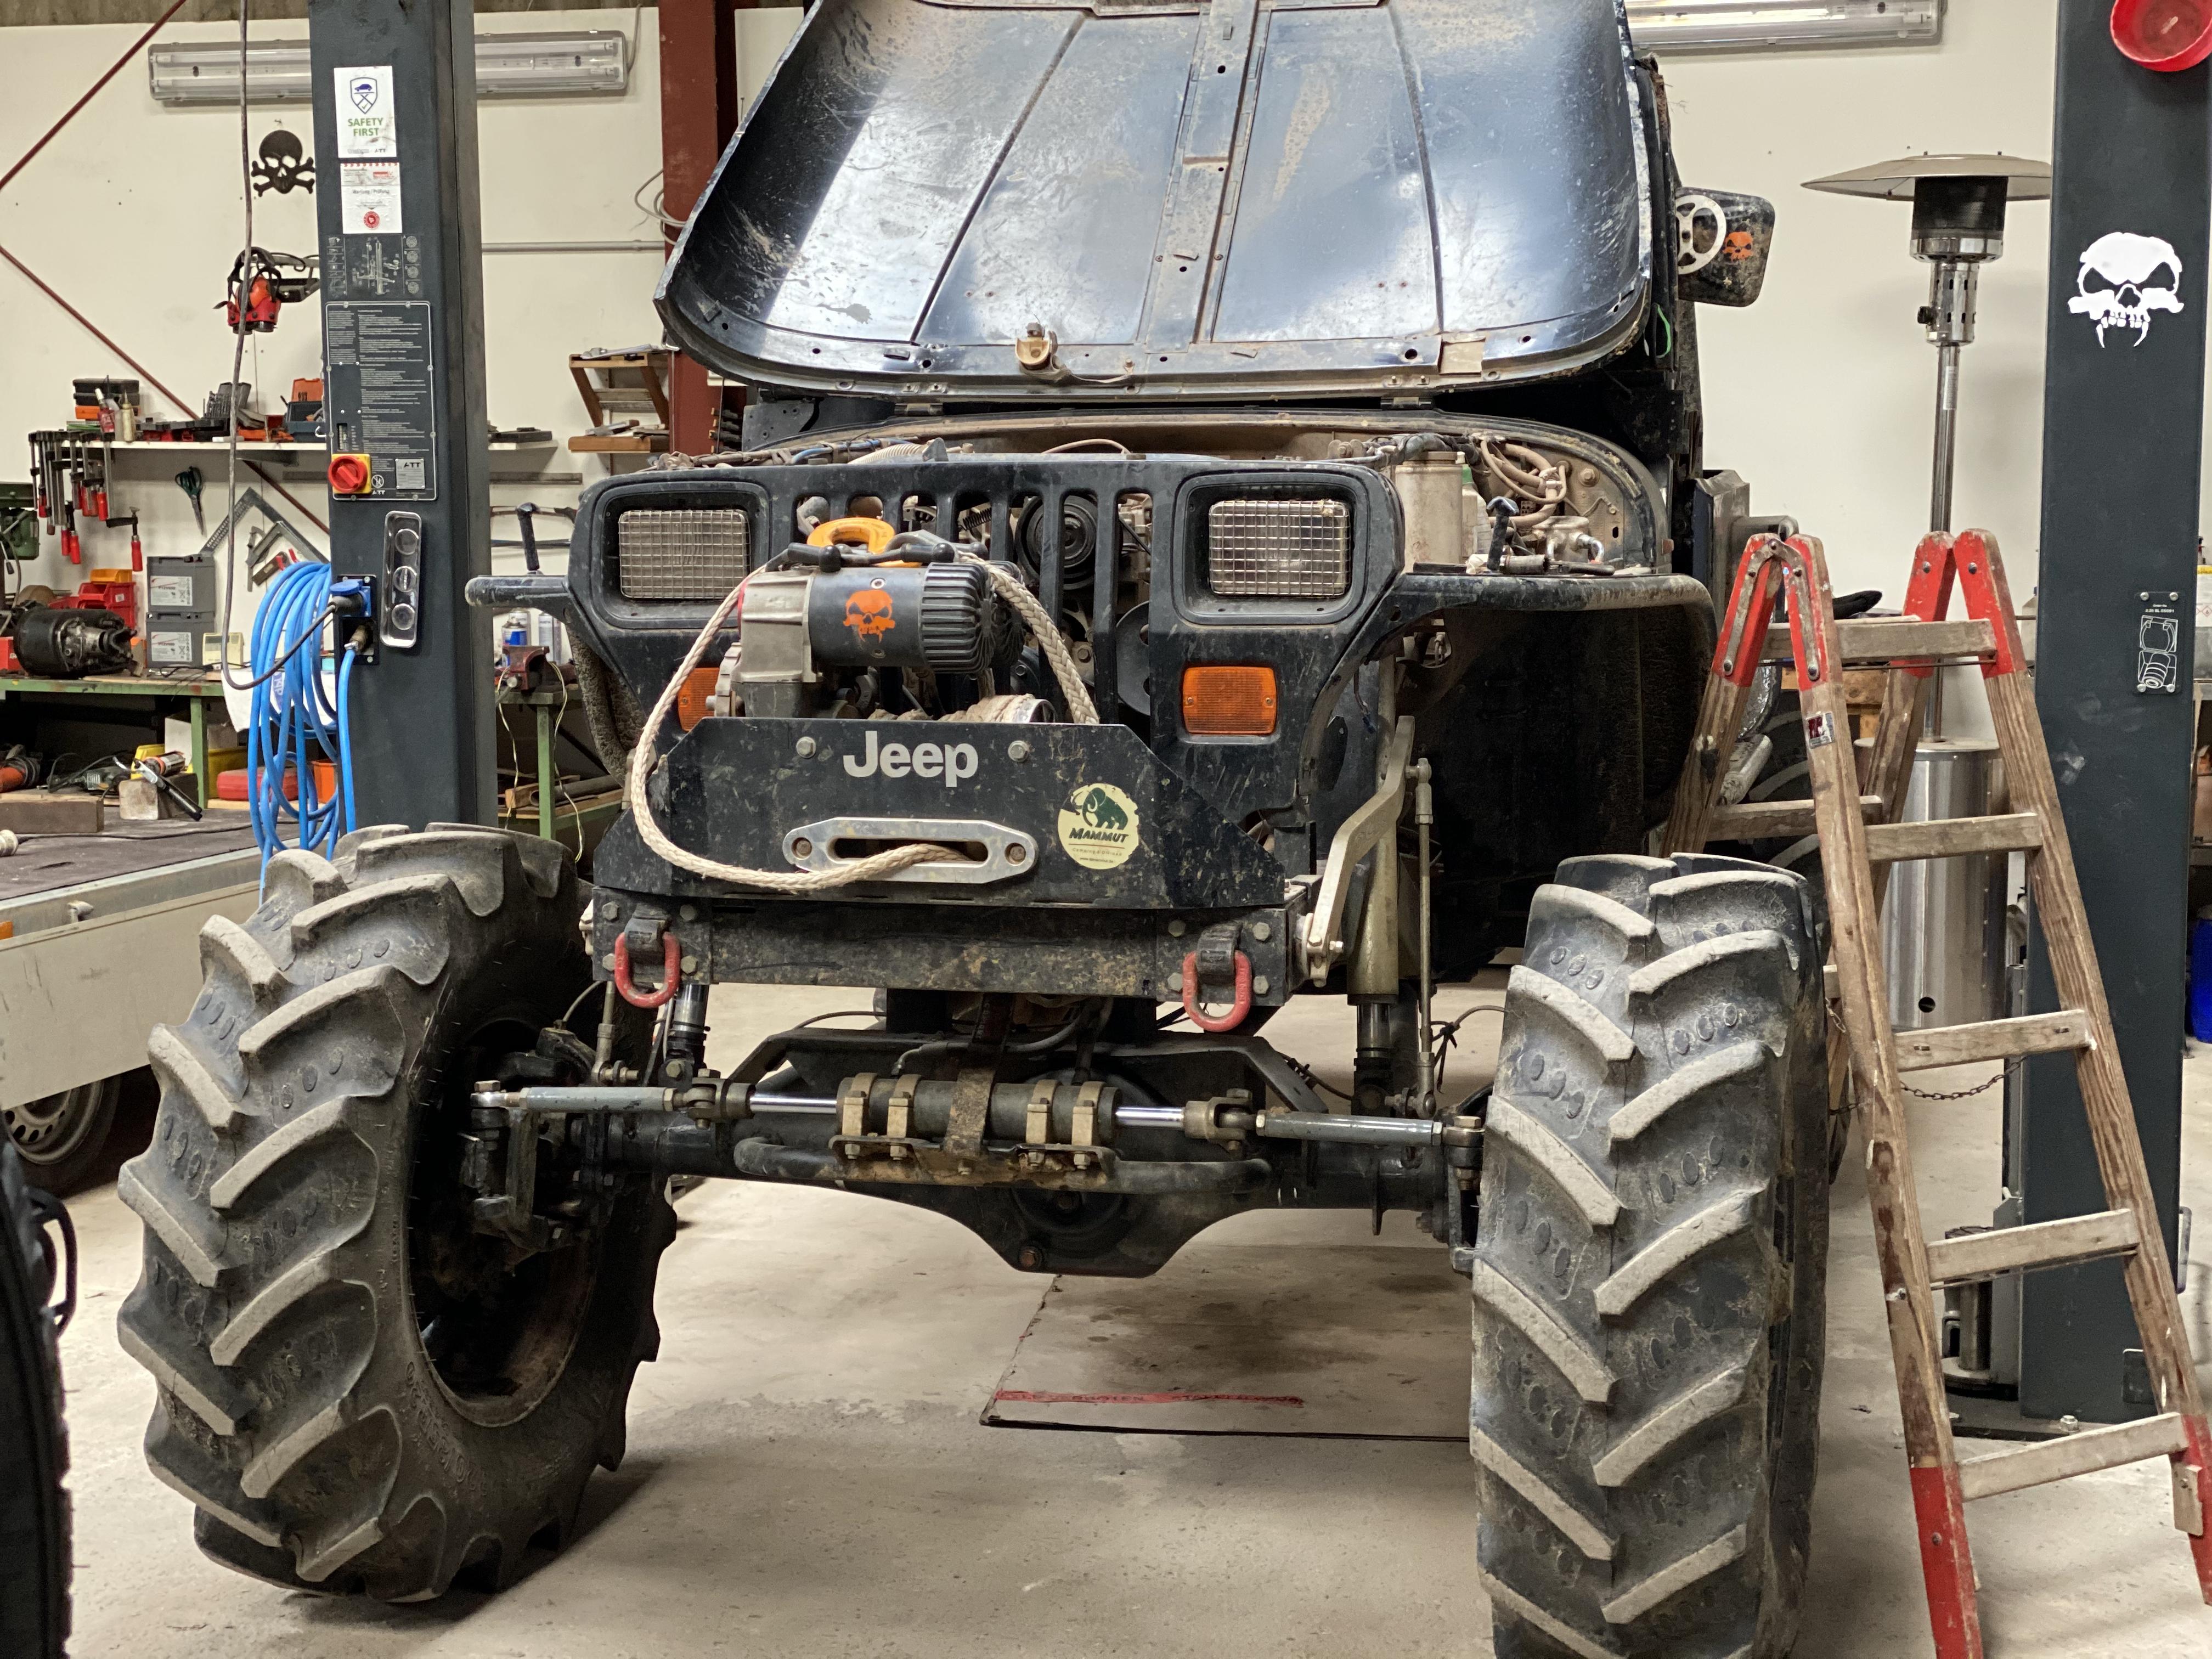 Trial-Jeep-Umbau von Tobi.